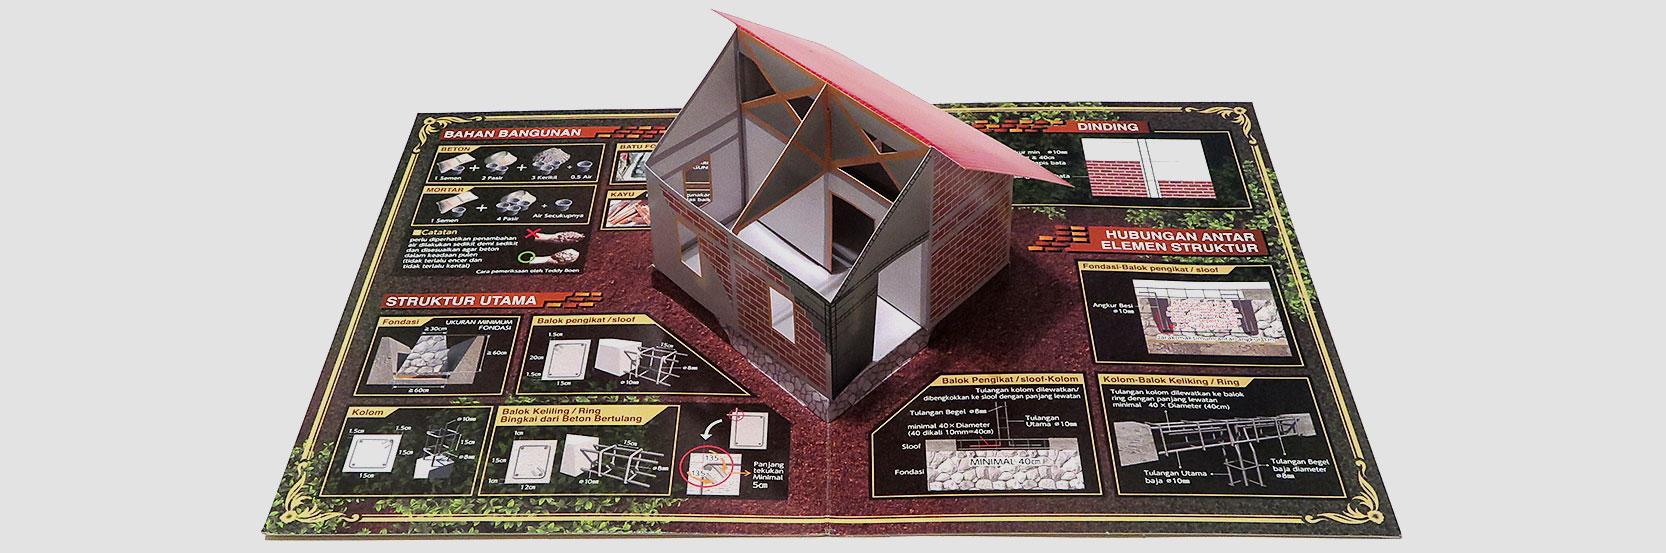 top-house01.jpg